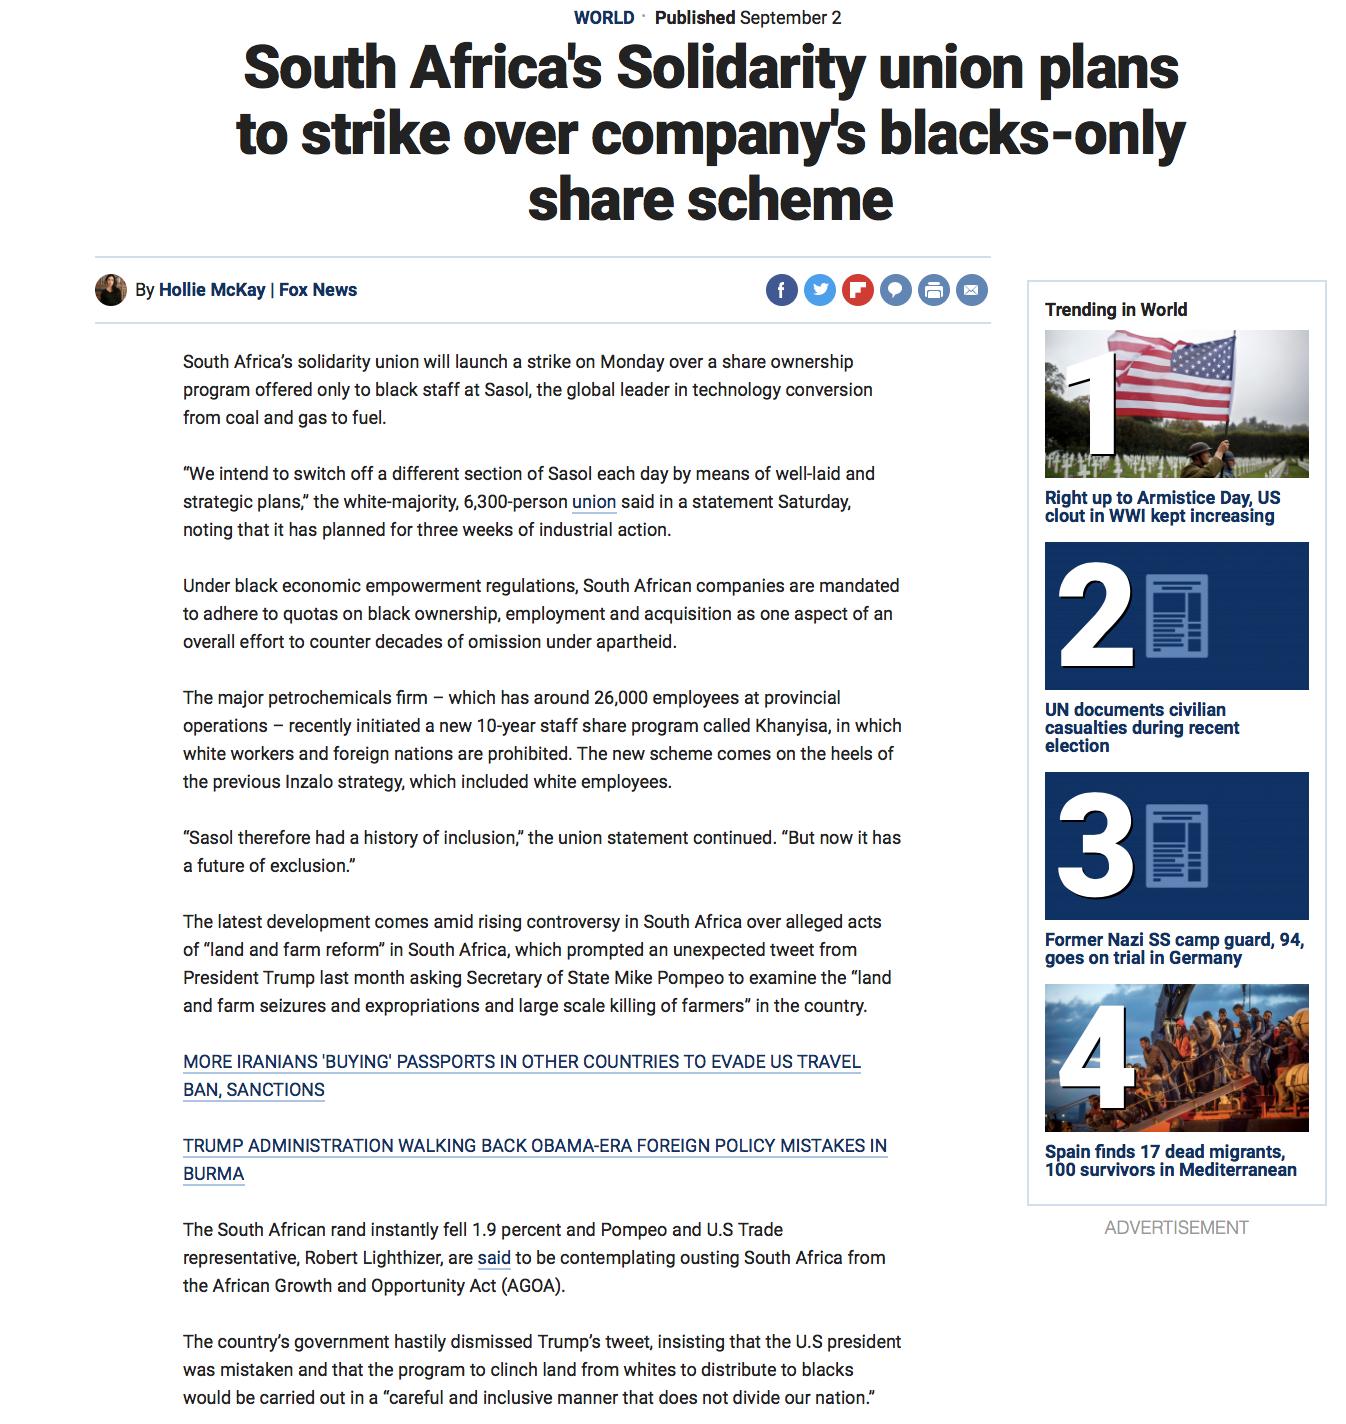 Tony schiena / Donald trump / South Africa